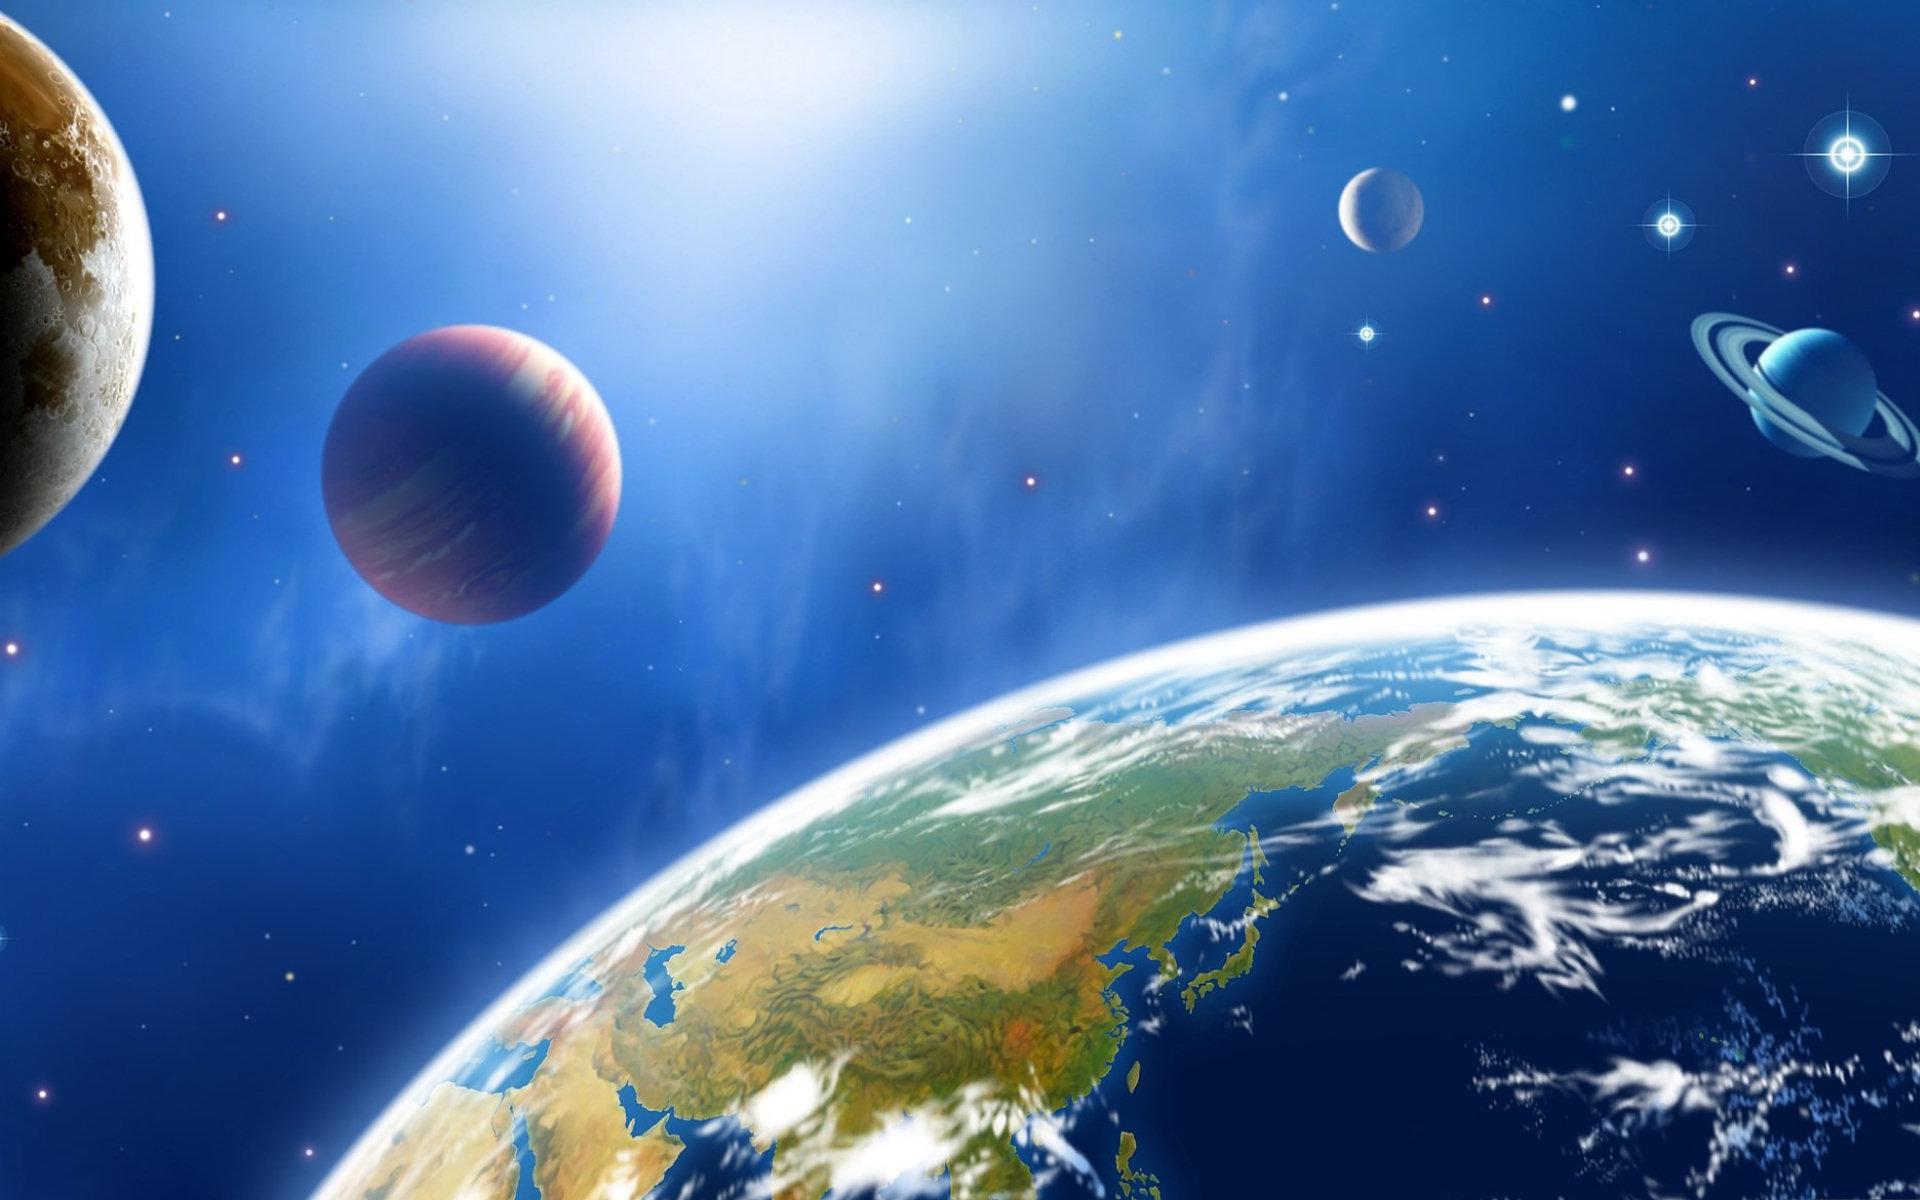 20 Space Exploration Wallpapers On Wallpapersafari